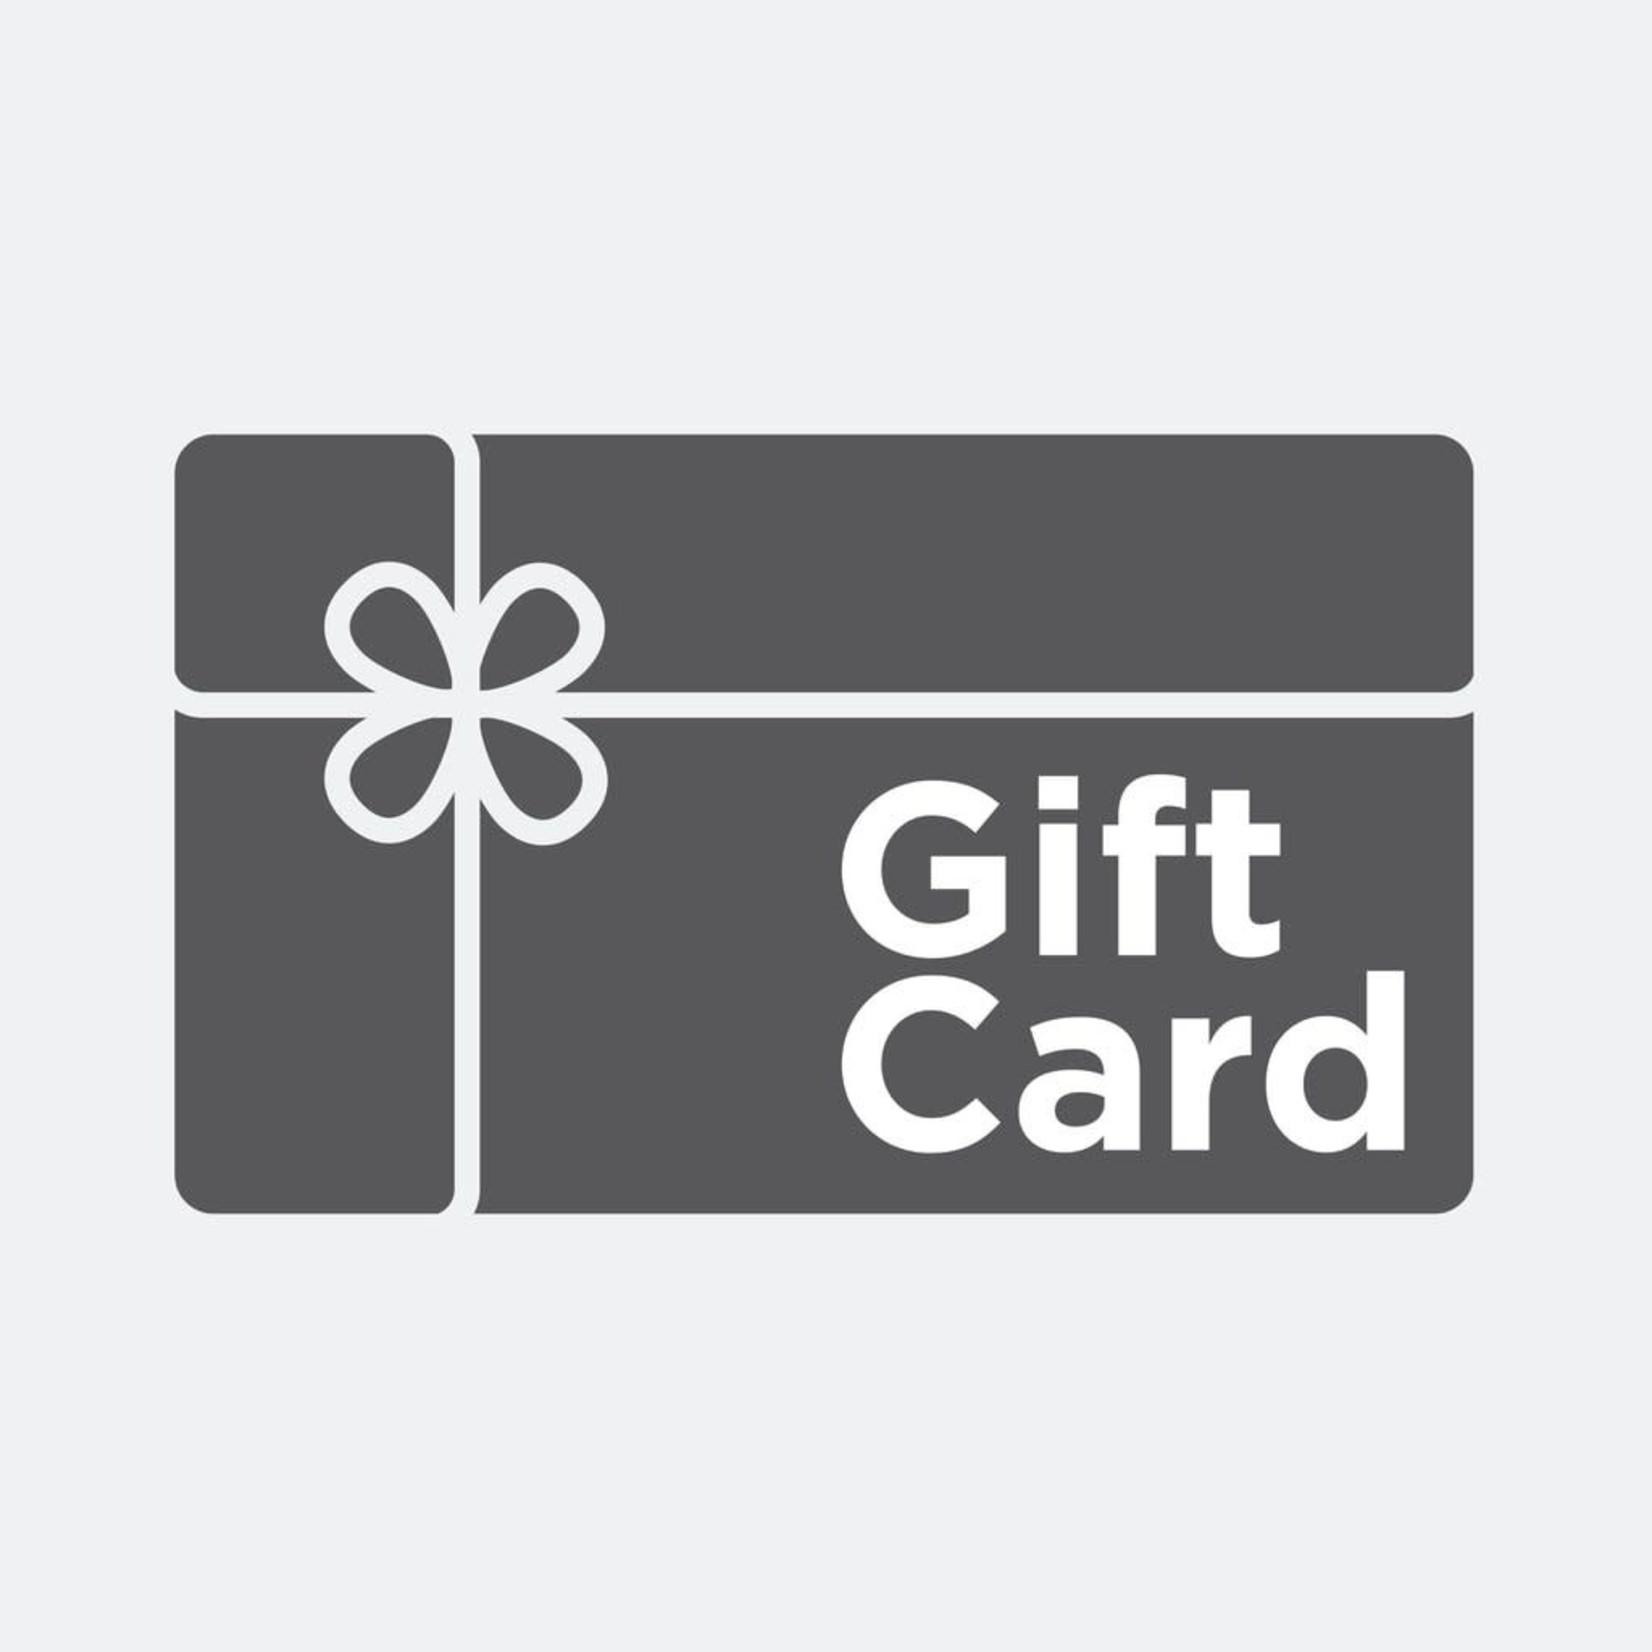 SportsVille Gift Card